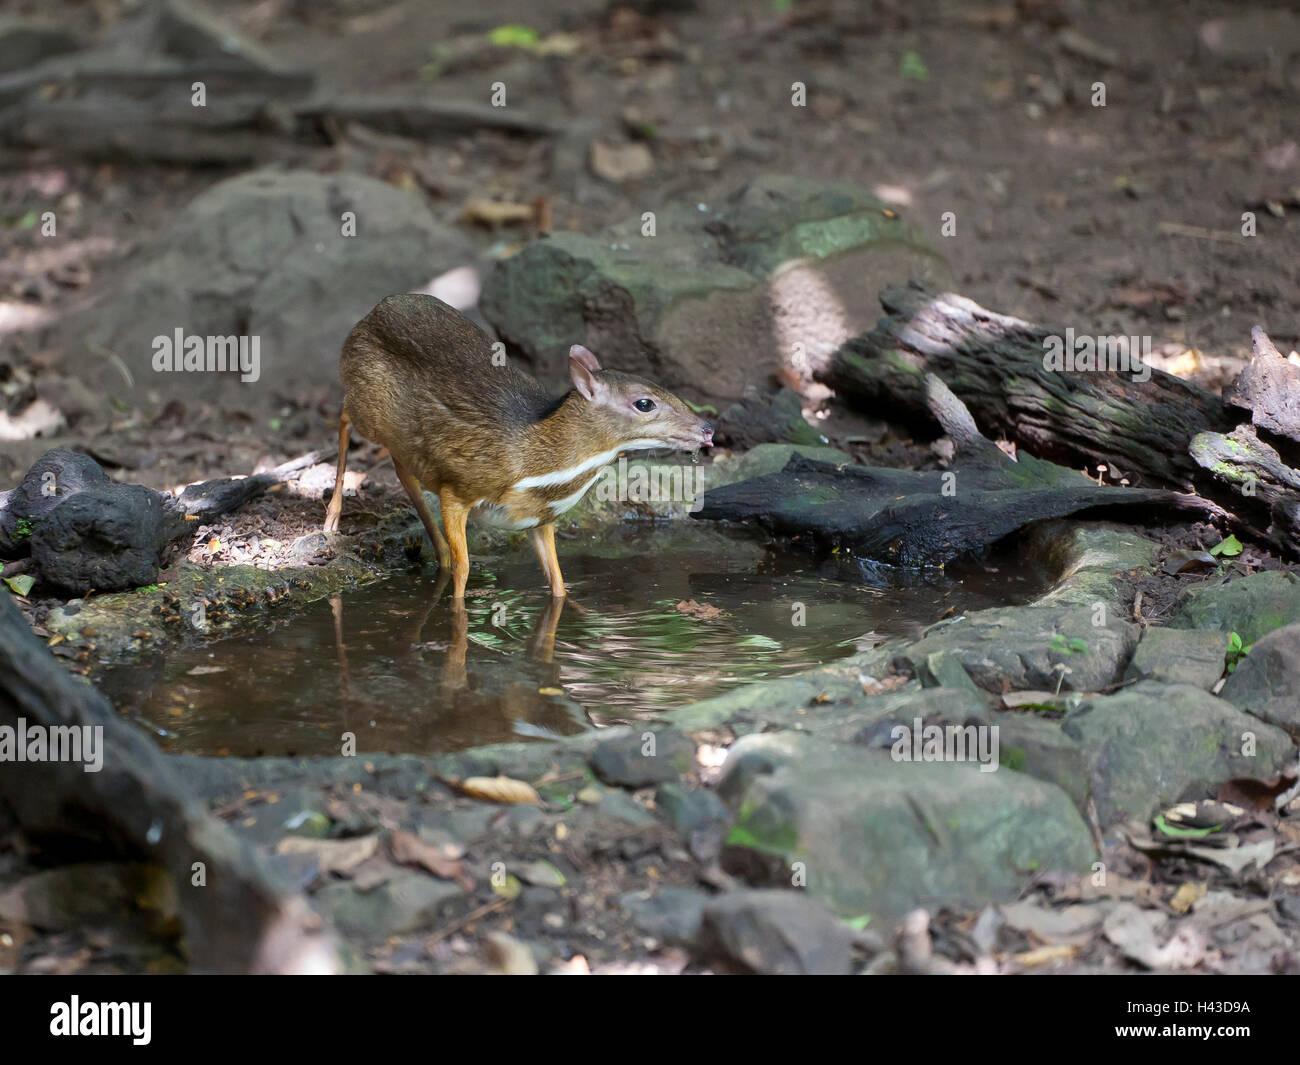 Lesser mouse-cervi o kanchil (Tragulus kanchil) a waterhole, Kaeng Krachan National Park, Phetchaburi, Thailandia Foto Stock